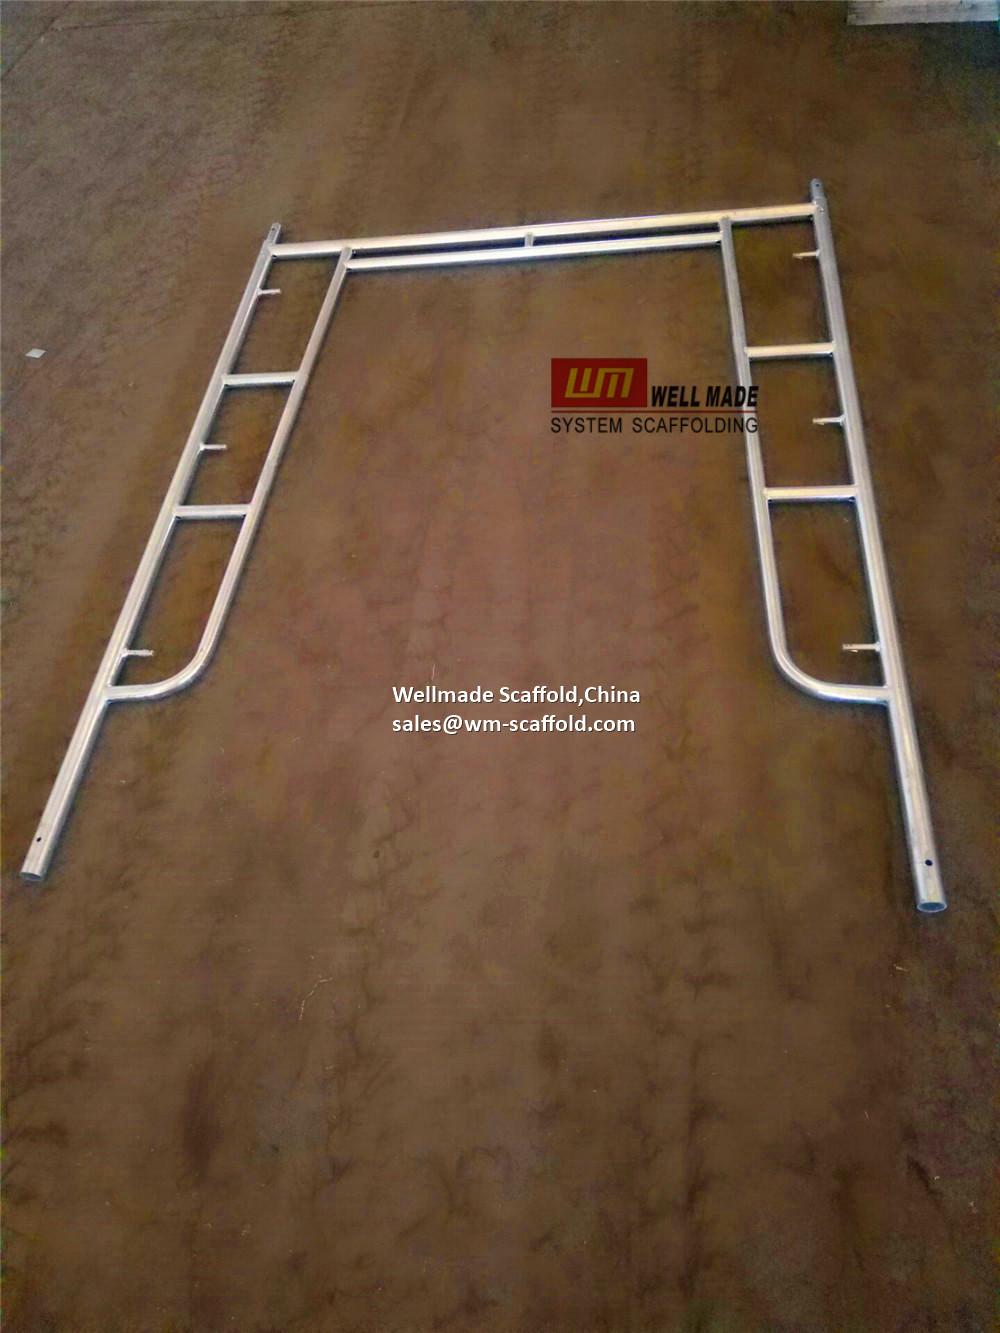 6ce7f9e65a9a4a drop lock pin arch frame scaffolding usa type - walk through scaffolding  parts components - new york city